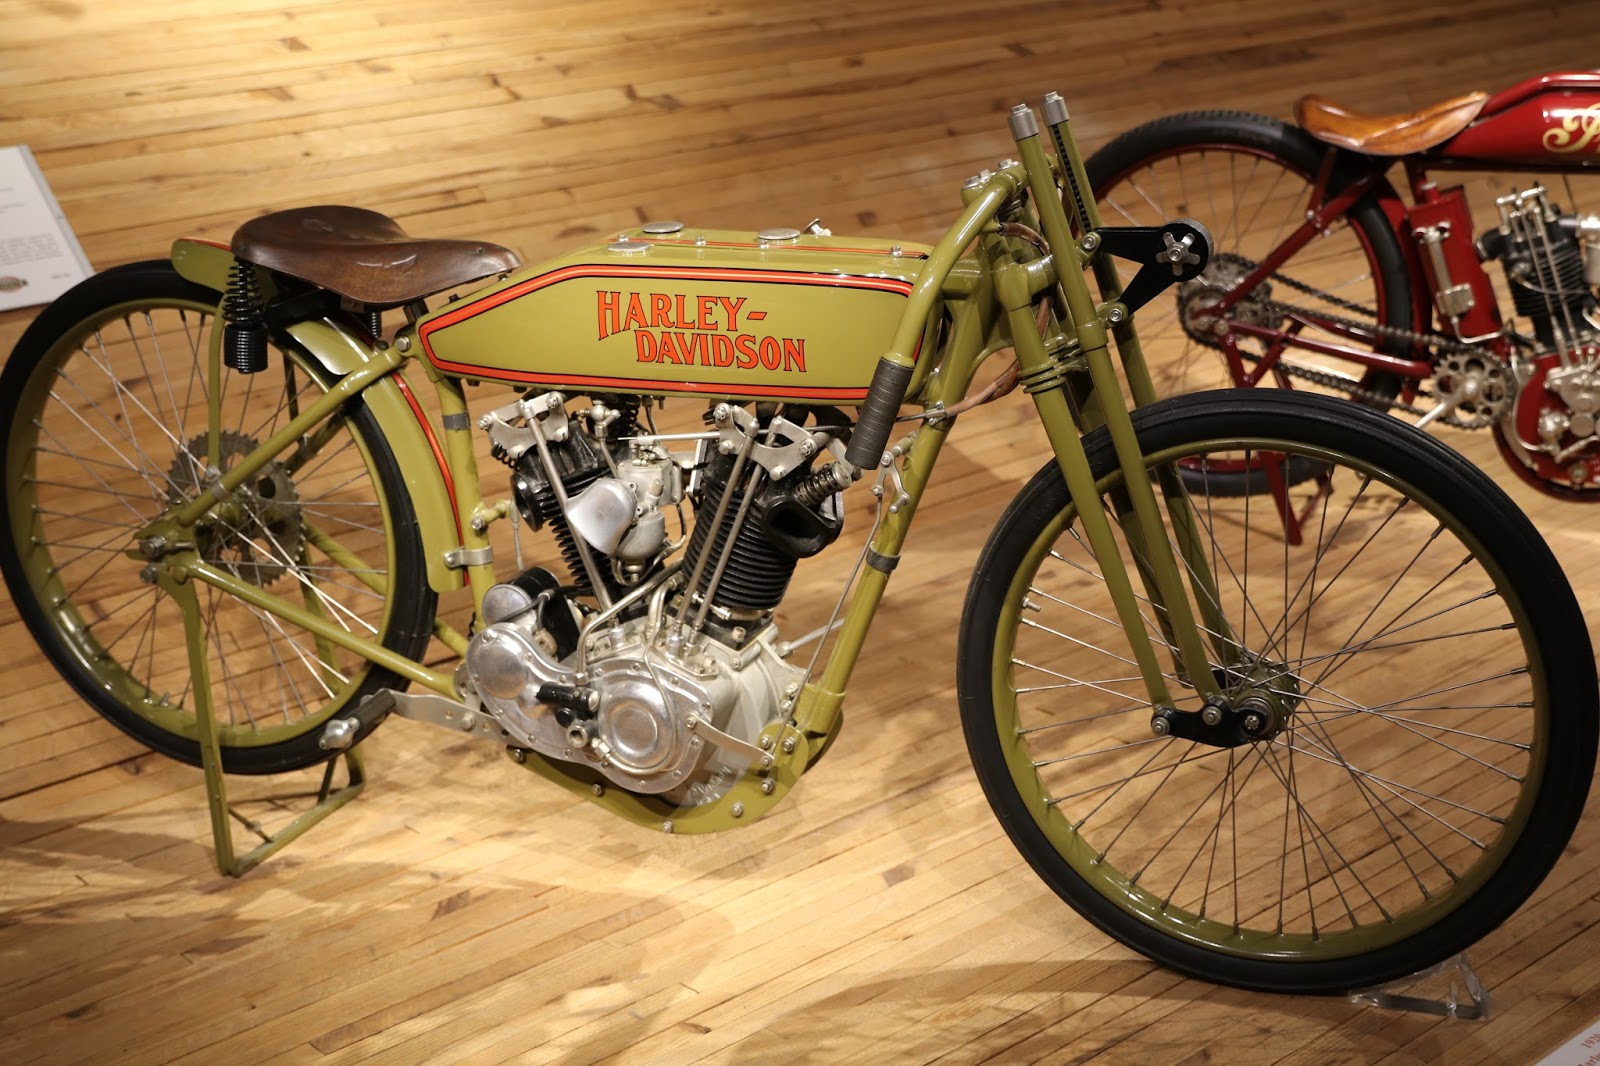 Harley Davidson Wheelies And More Harley Davidson Chabott